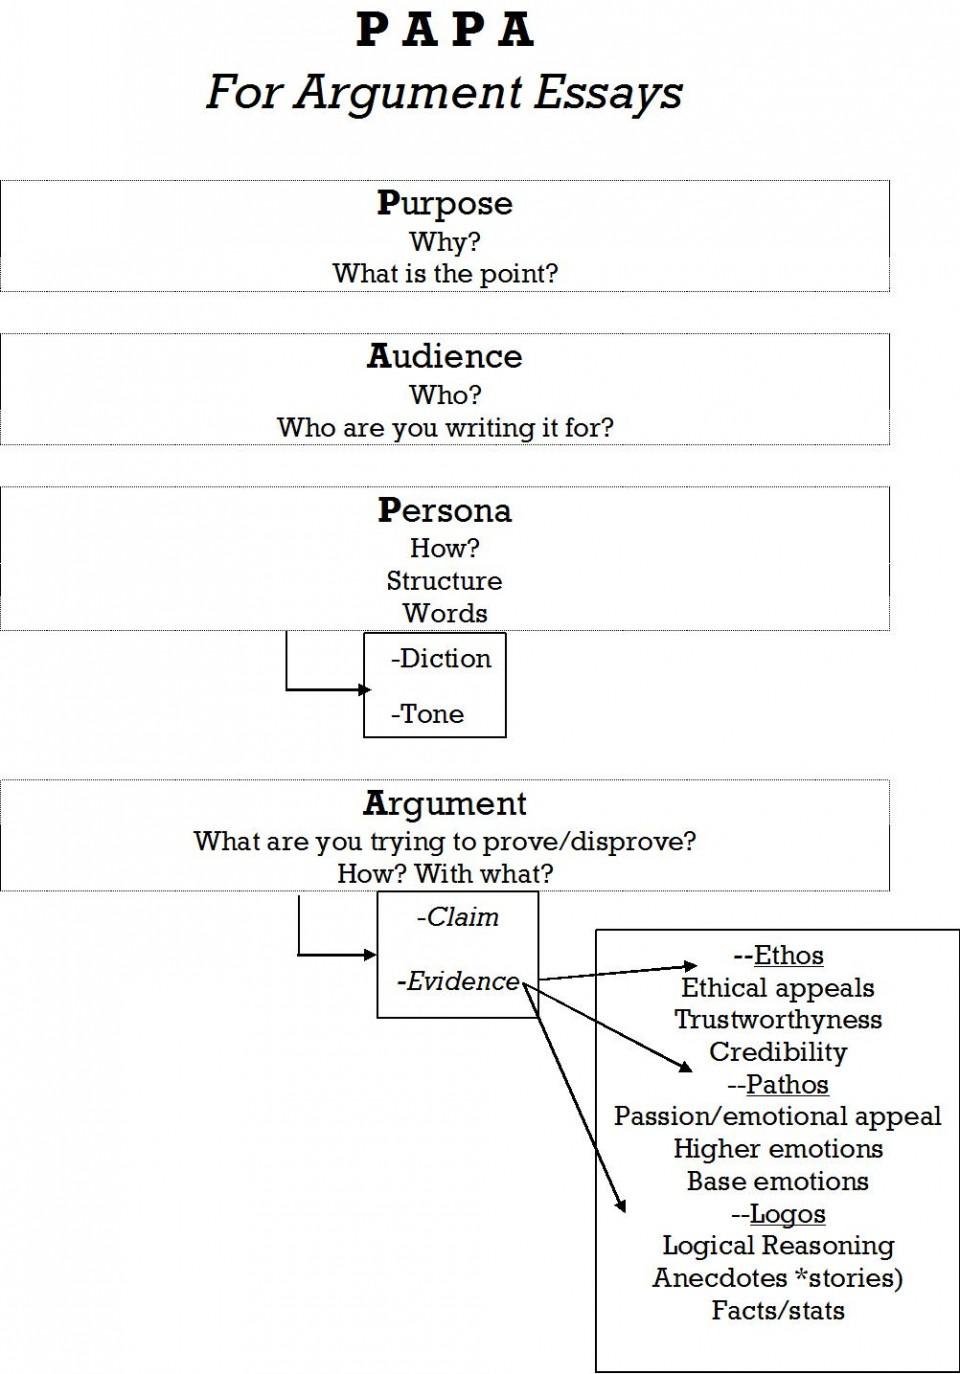 004 Parts Of Persuasive Essay Papa Jpg Imposing 6 A 960